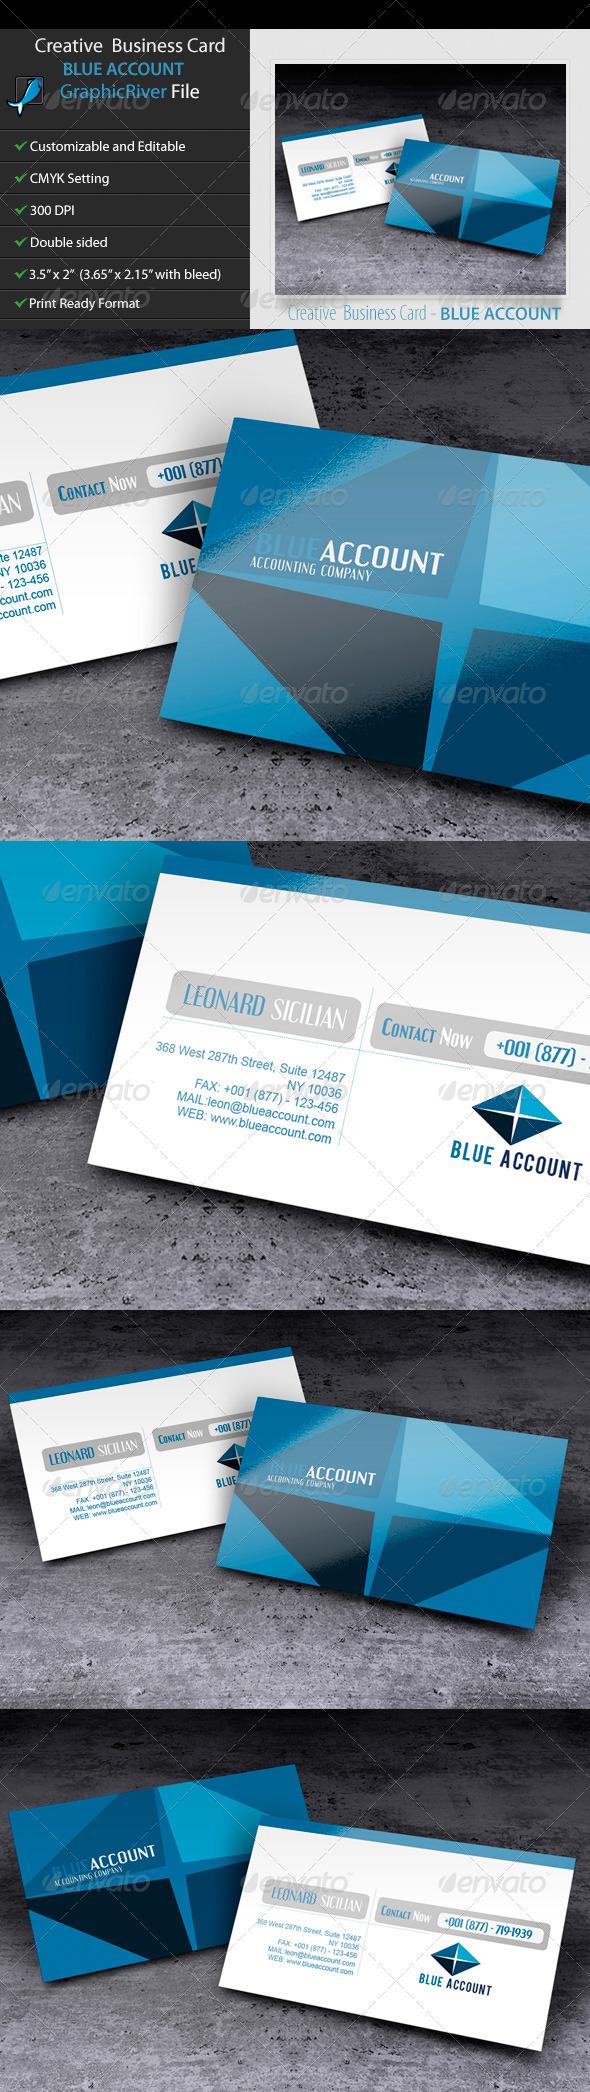 GraphicRiver Creative Business Card BlueAccount 5579457